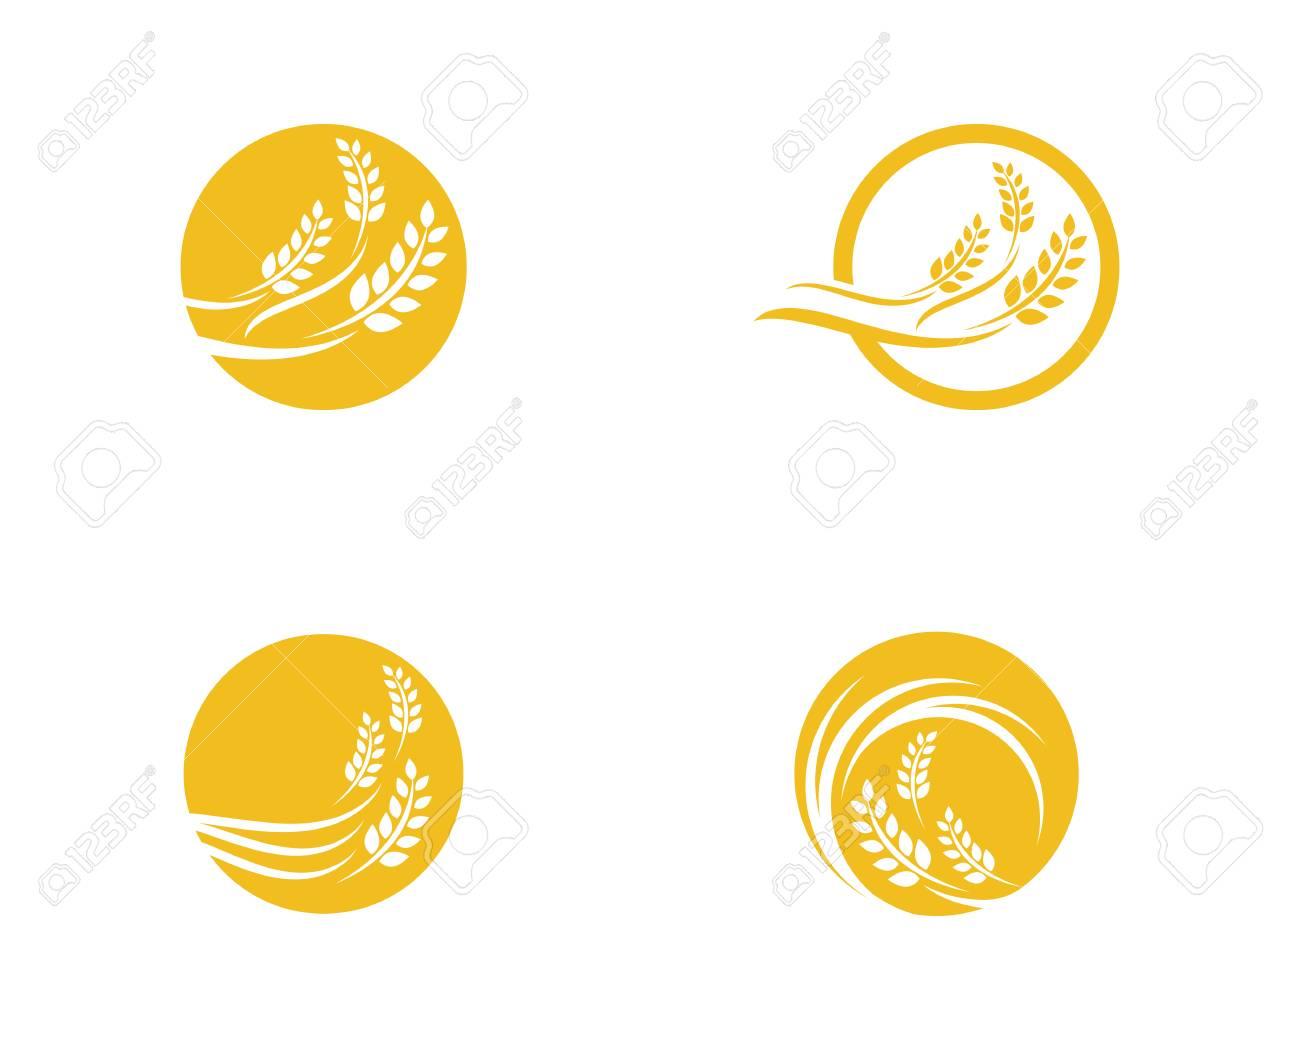 Agricultura Trigo Logo Plantilla, Diseño De Icono De Vector ...